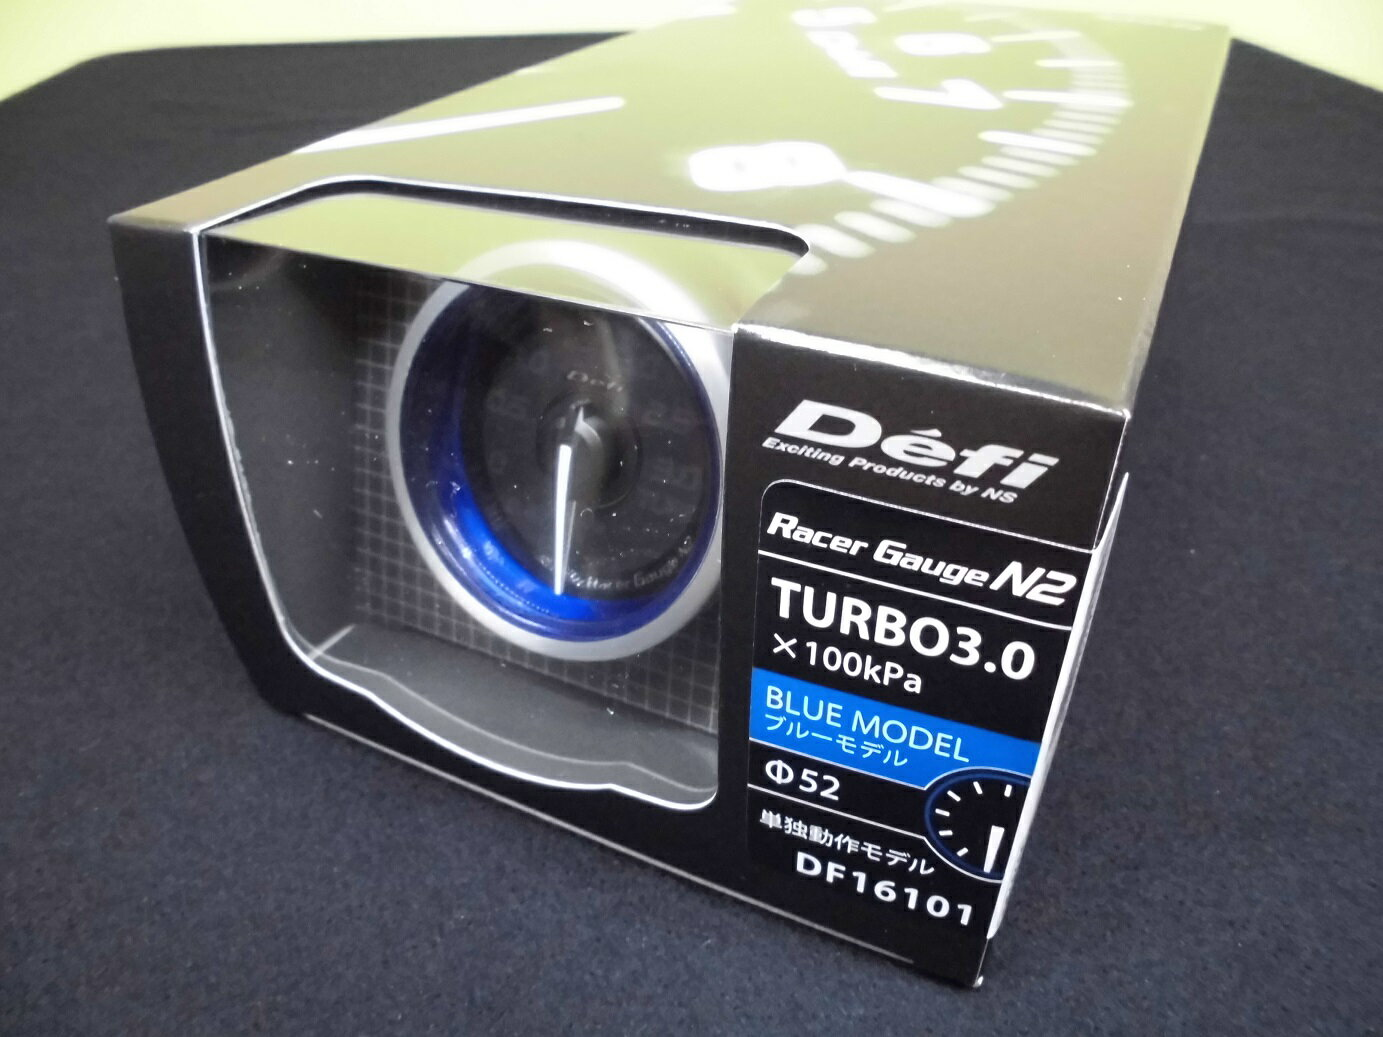 Defi Racer Gauge N2 デフィ レーサーゲージ 52Φ ターボ計 (ブースト計) MAX表示300KPA DF16101「送料無料!!」